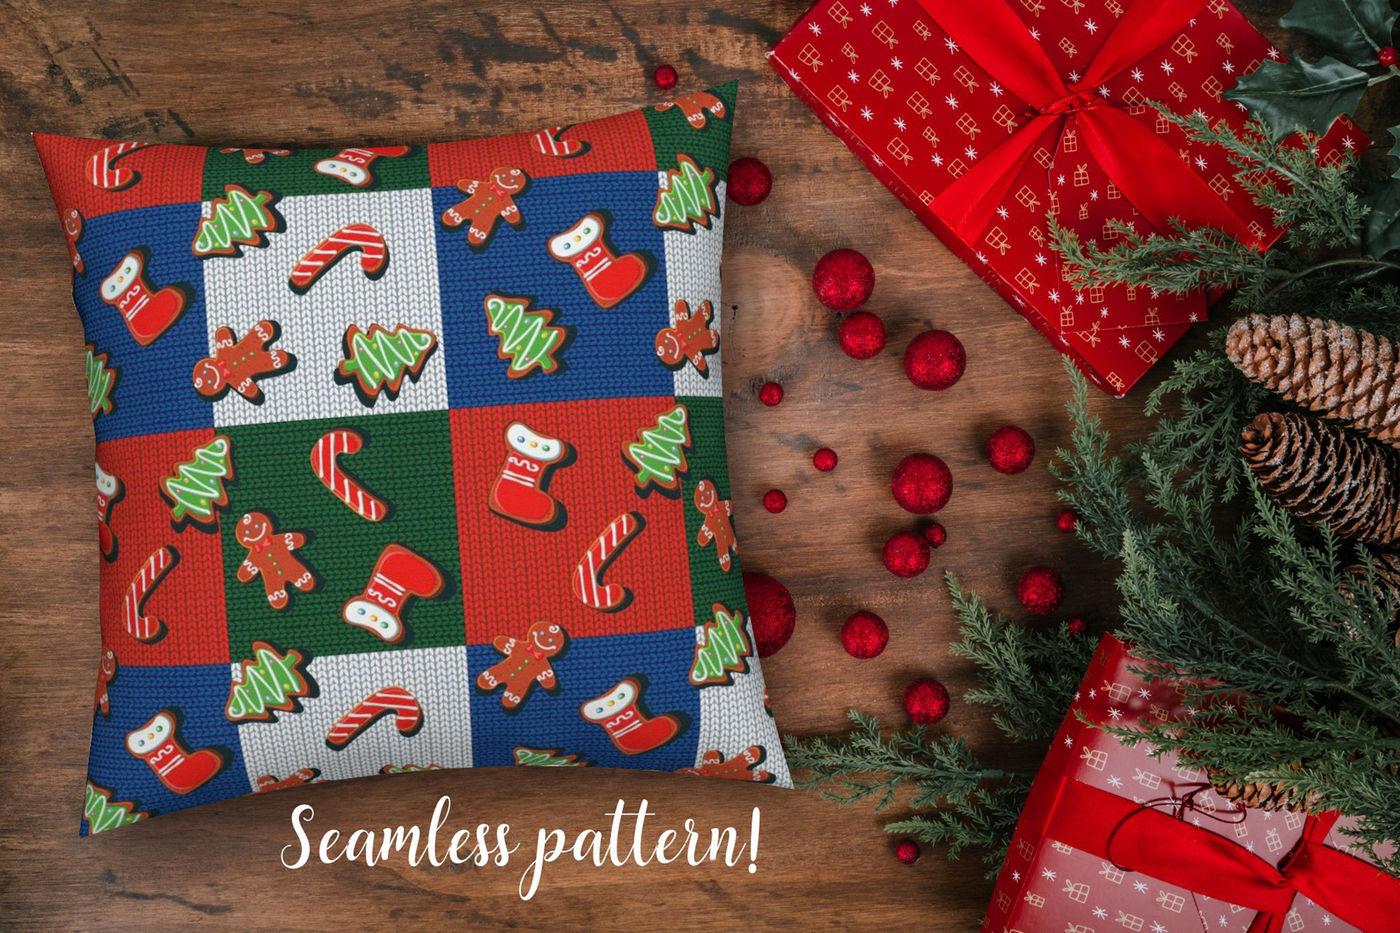 Winter Holiday Patterns Christmas Mood By Olgagriga Art